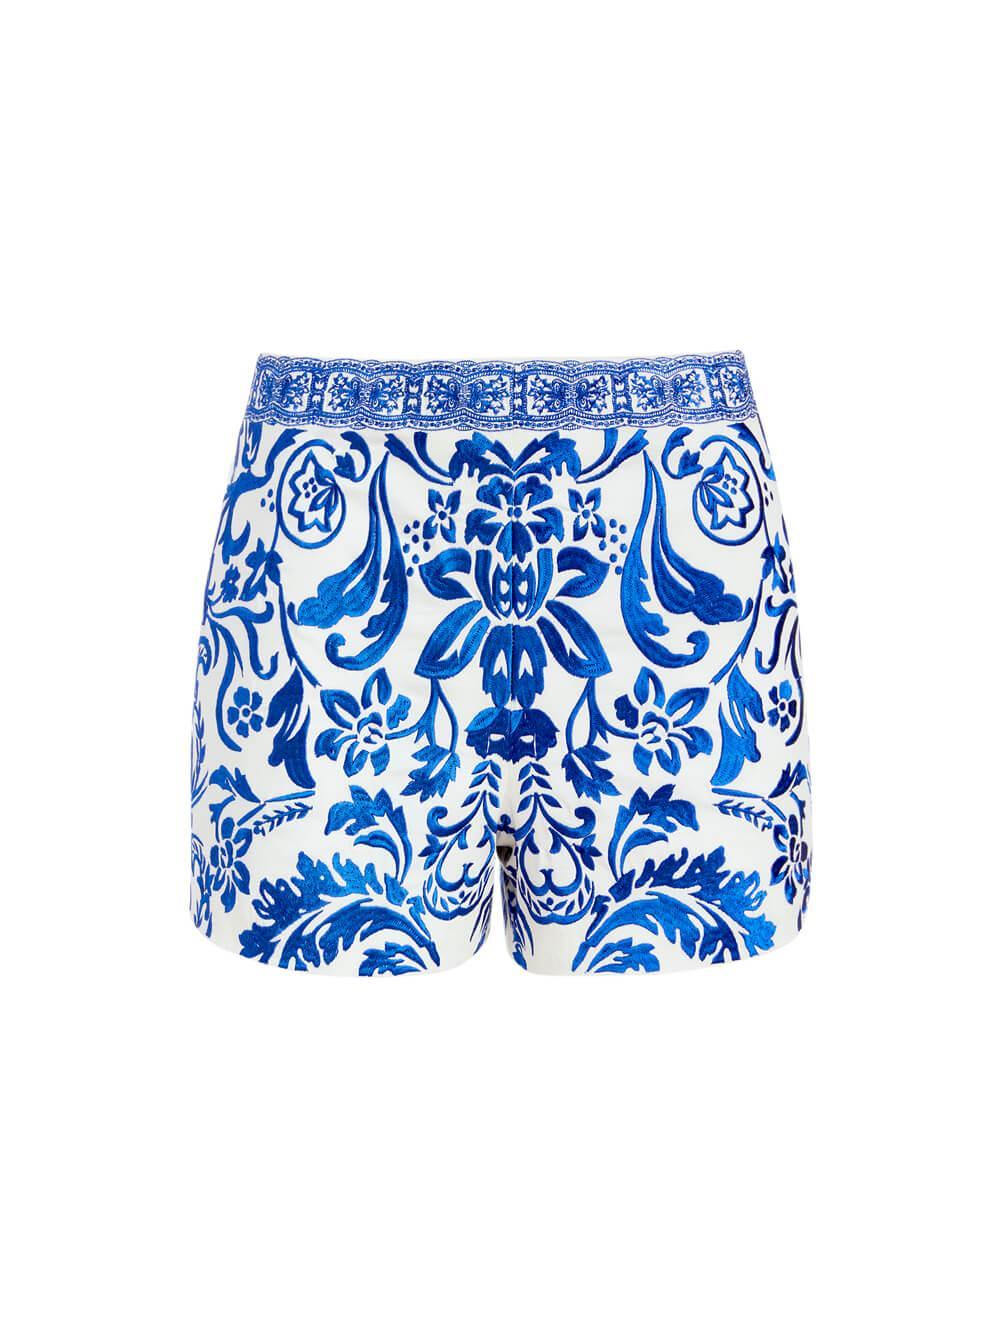 Sherri Embroidered Shorts